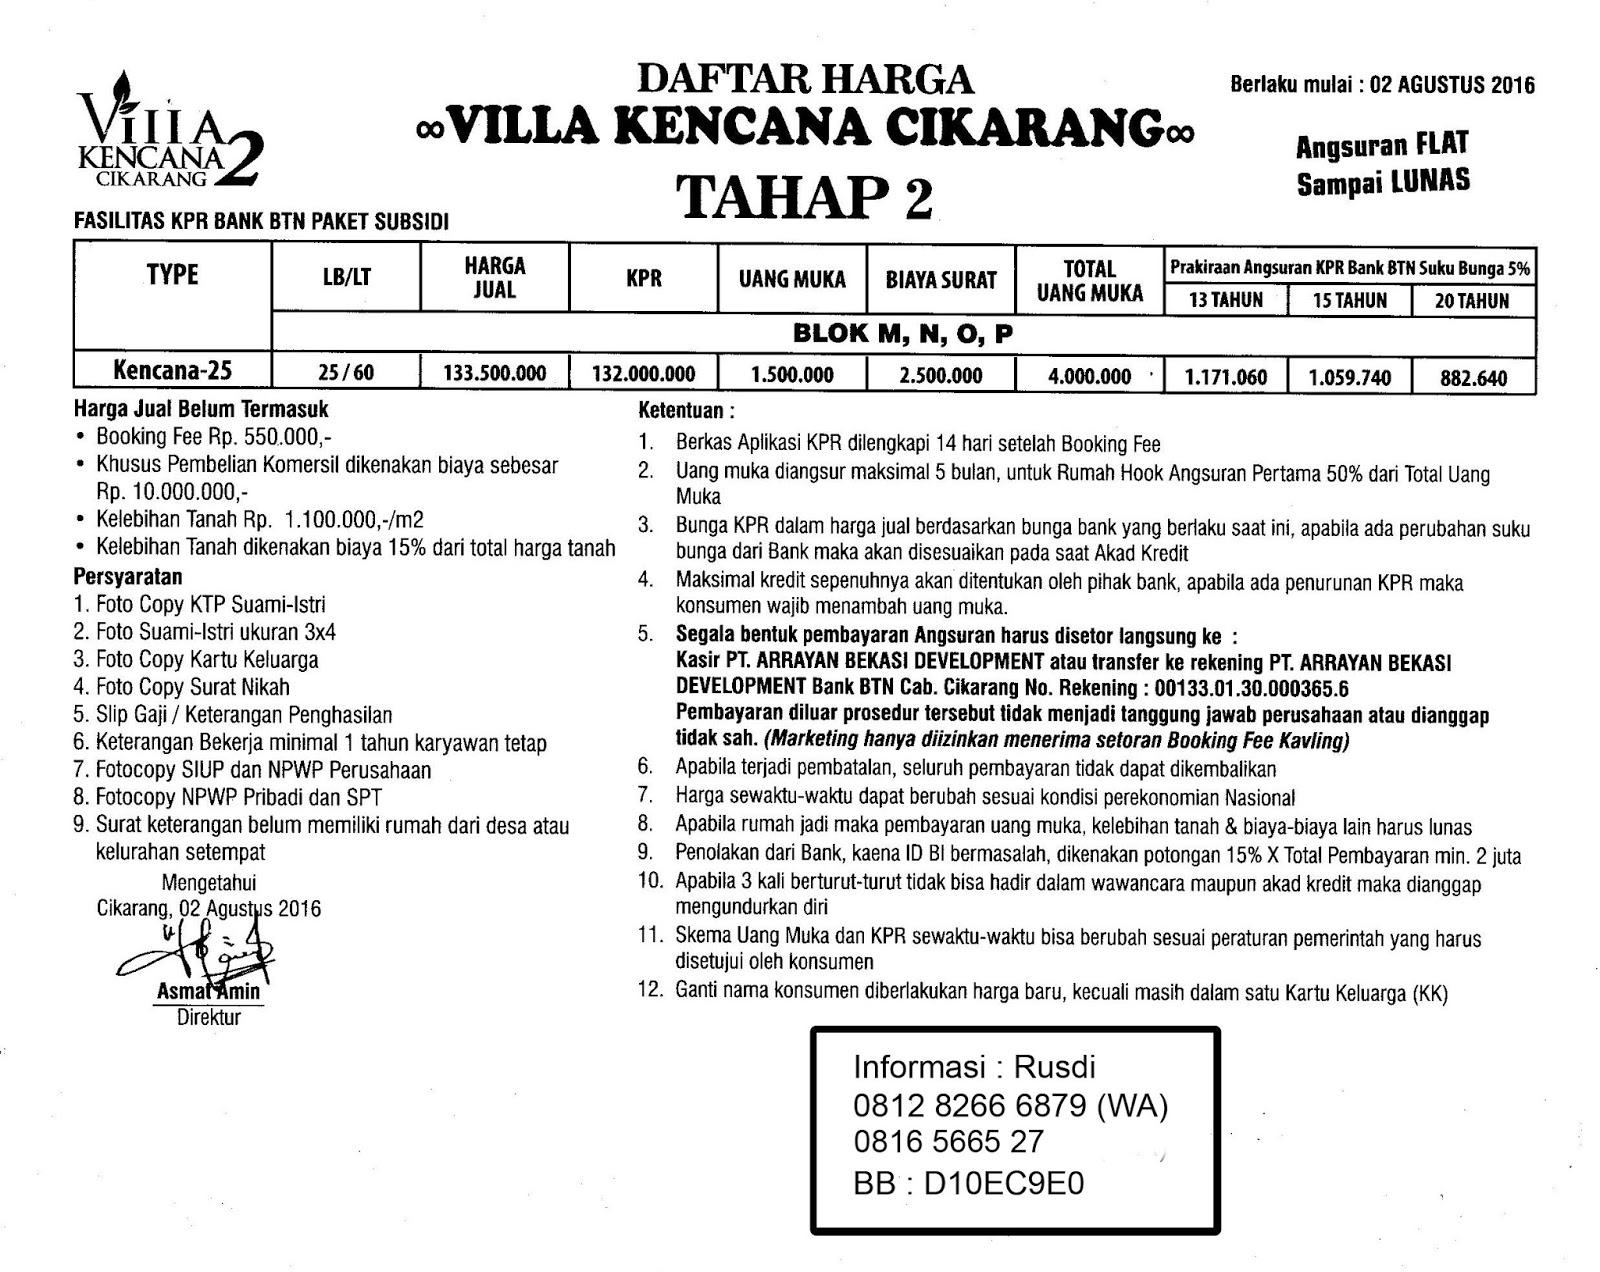 PROMO] OFF 1 Bdr Kencana Villa Seminyak Bali Indonesia